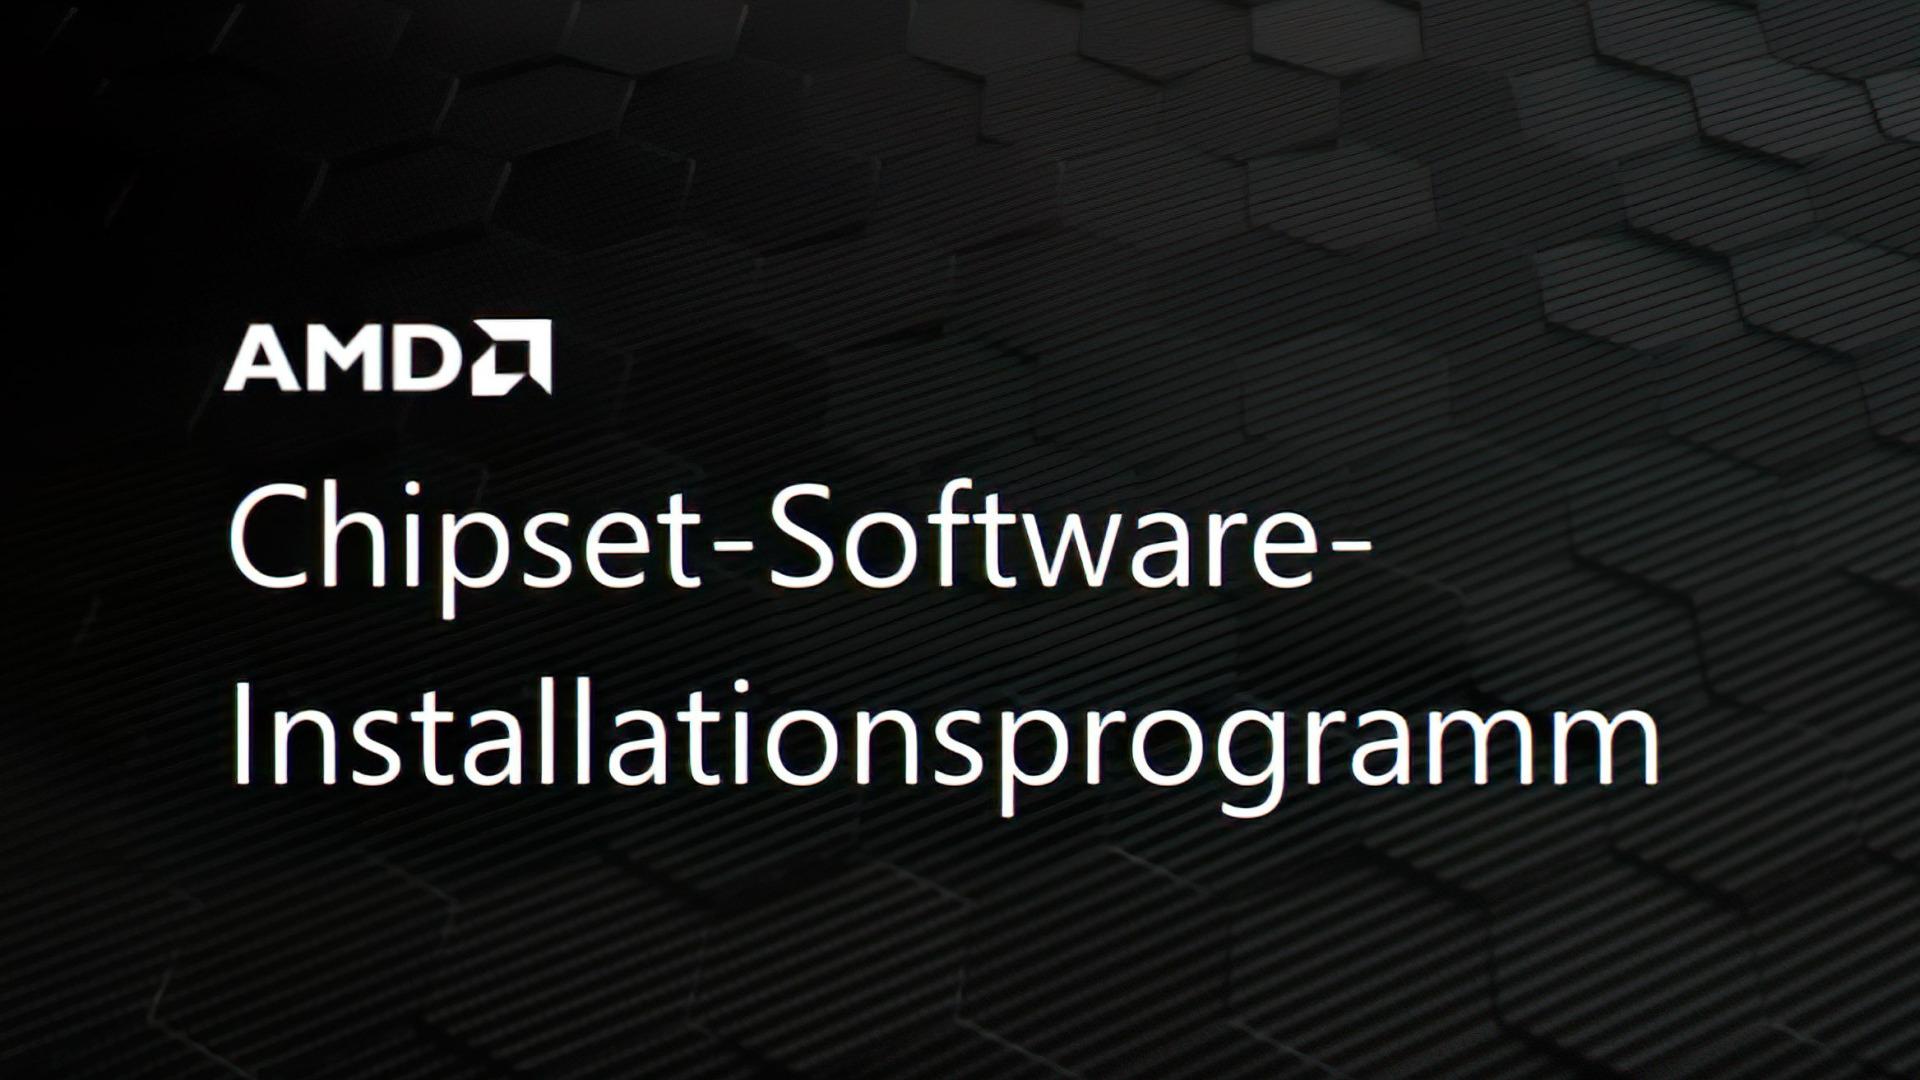 Amd, AMD Chipset Drivers, AMD Ryzen Chipsatztreiber